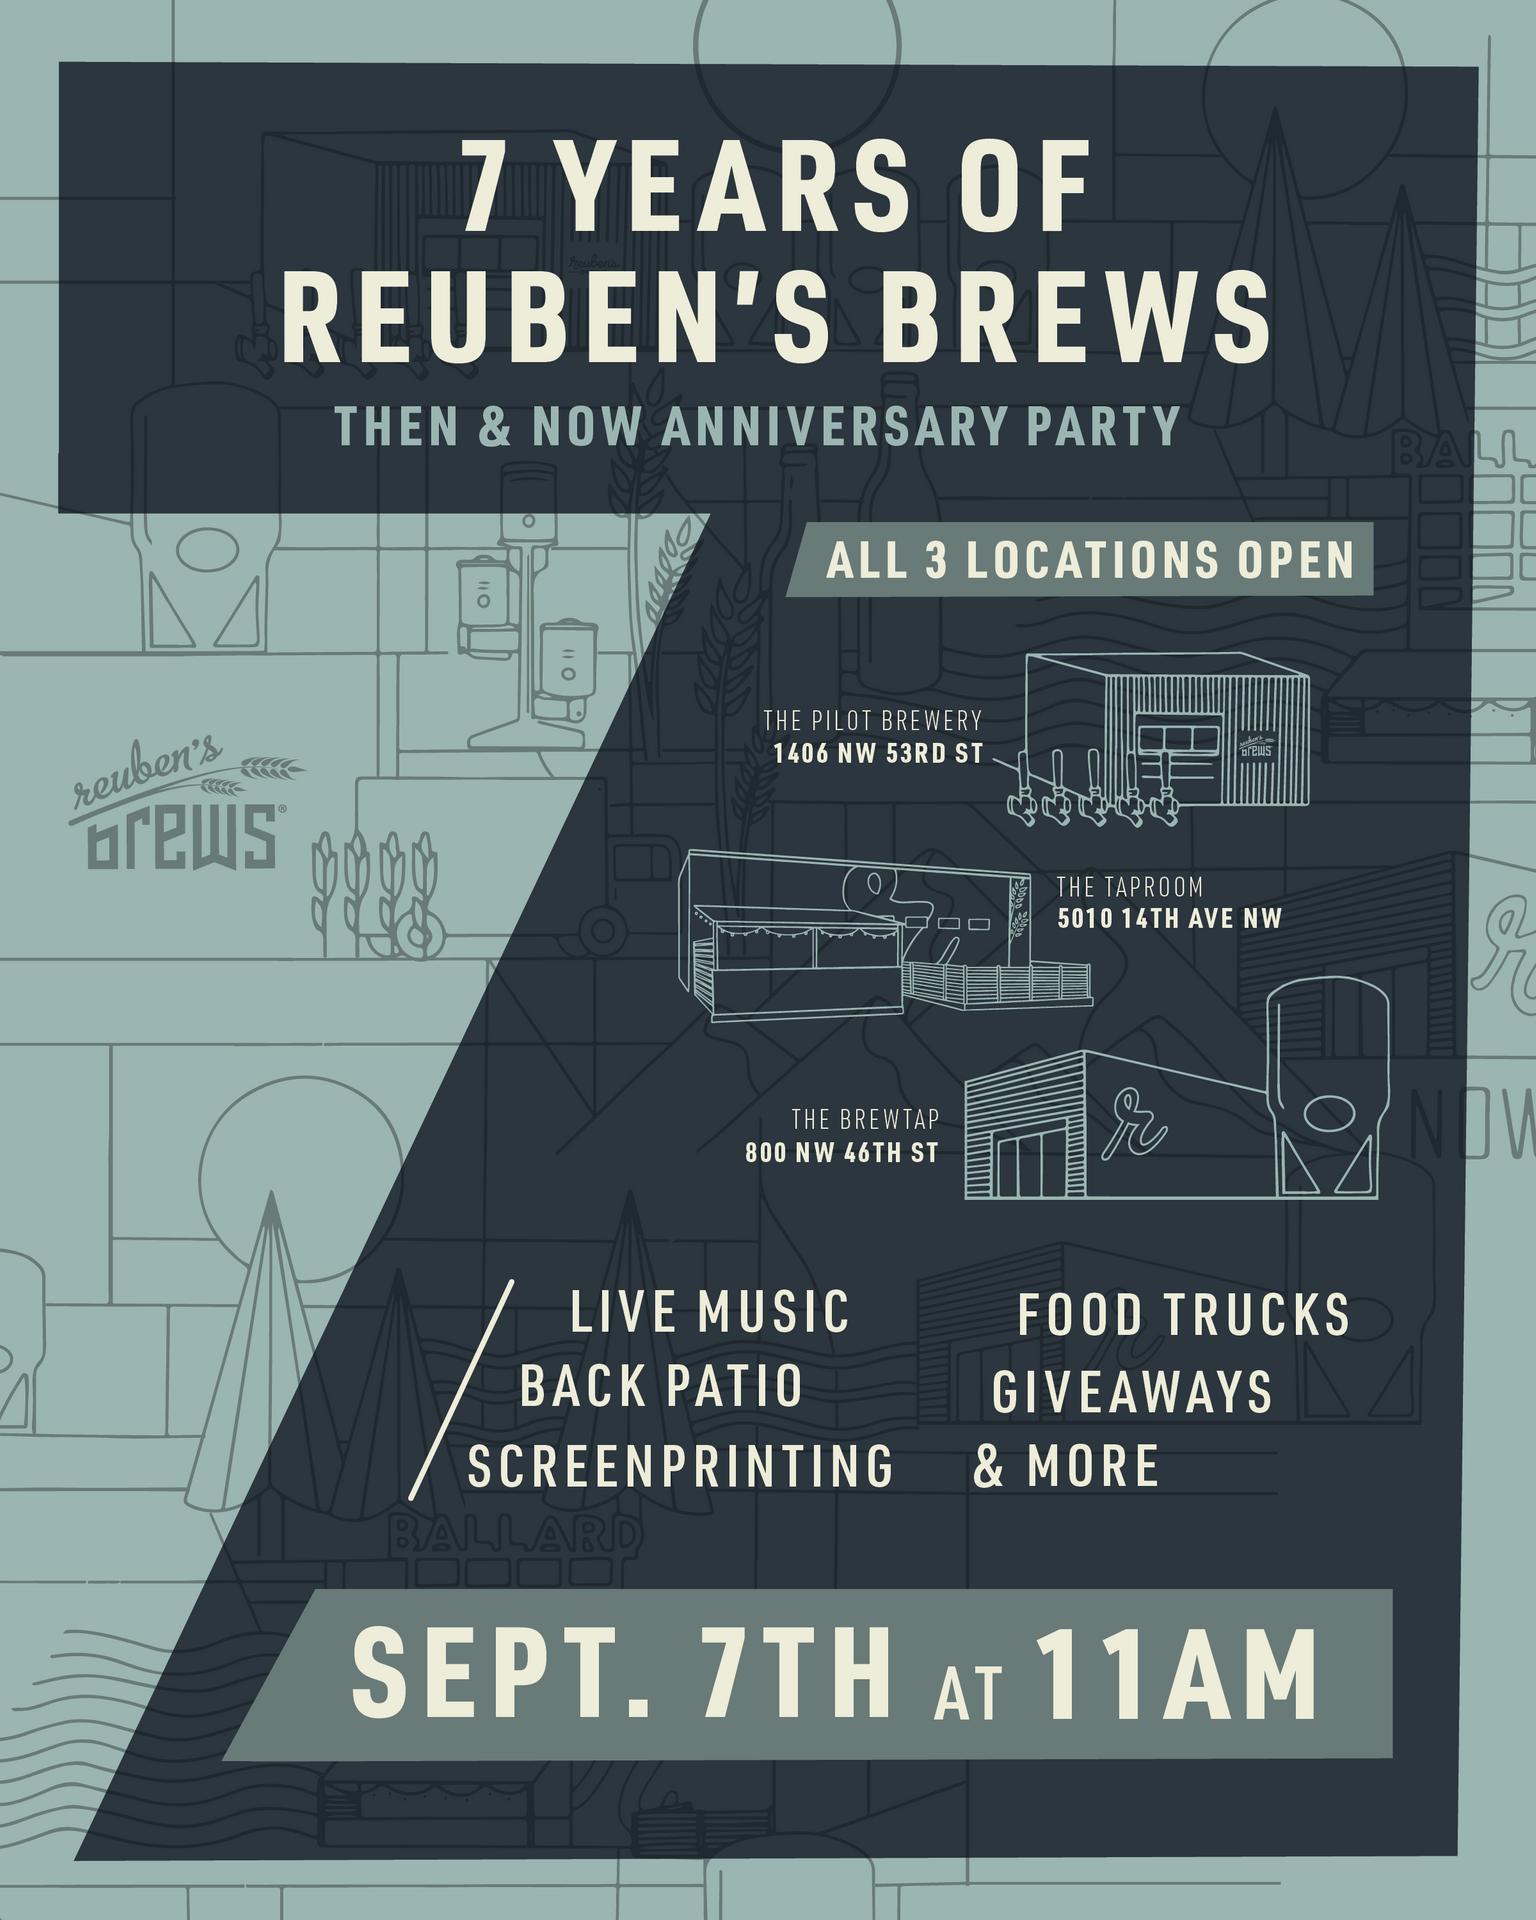 7 Years of Reuben's Brews